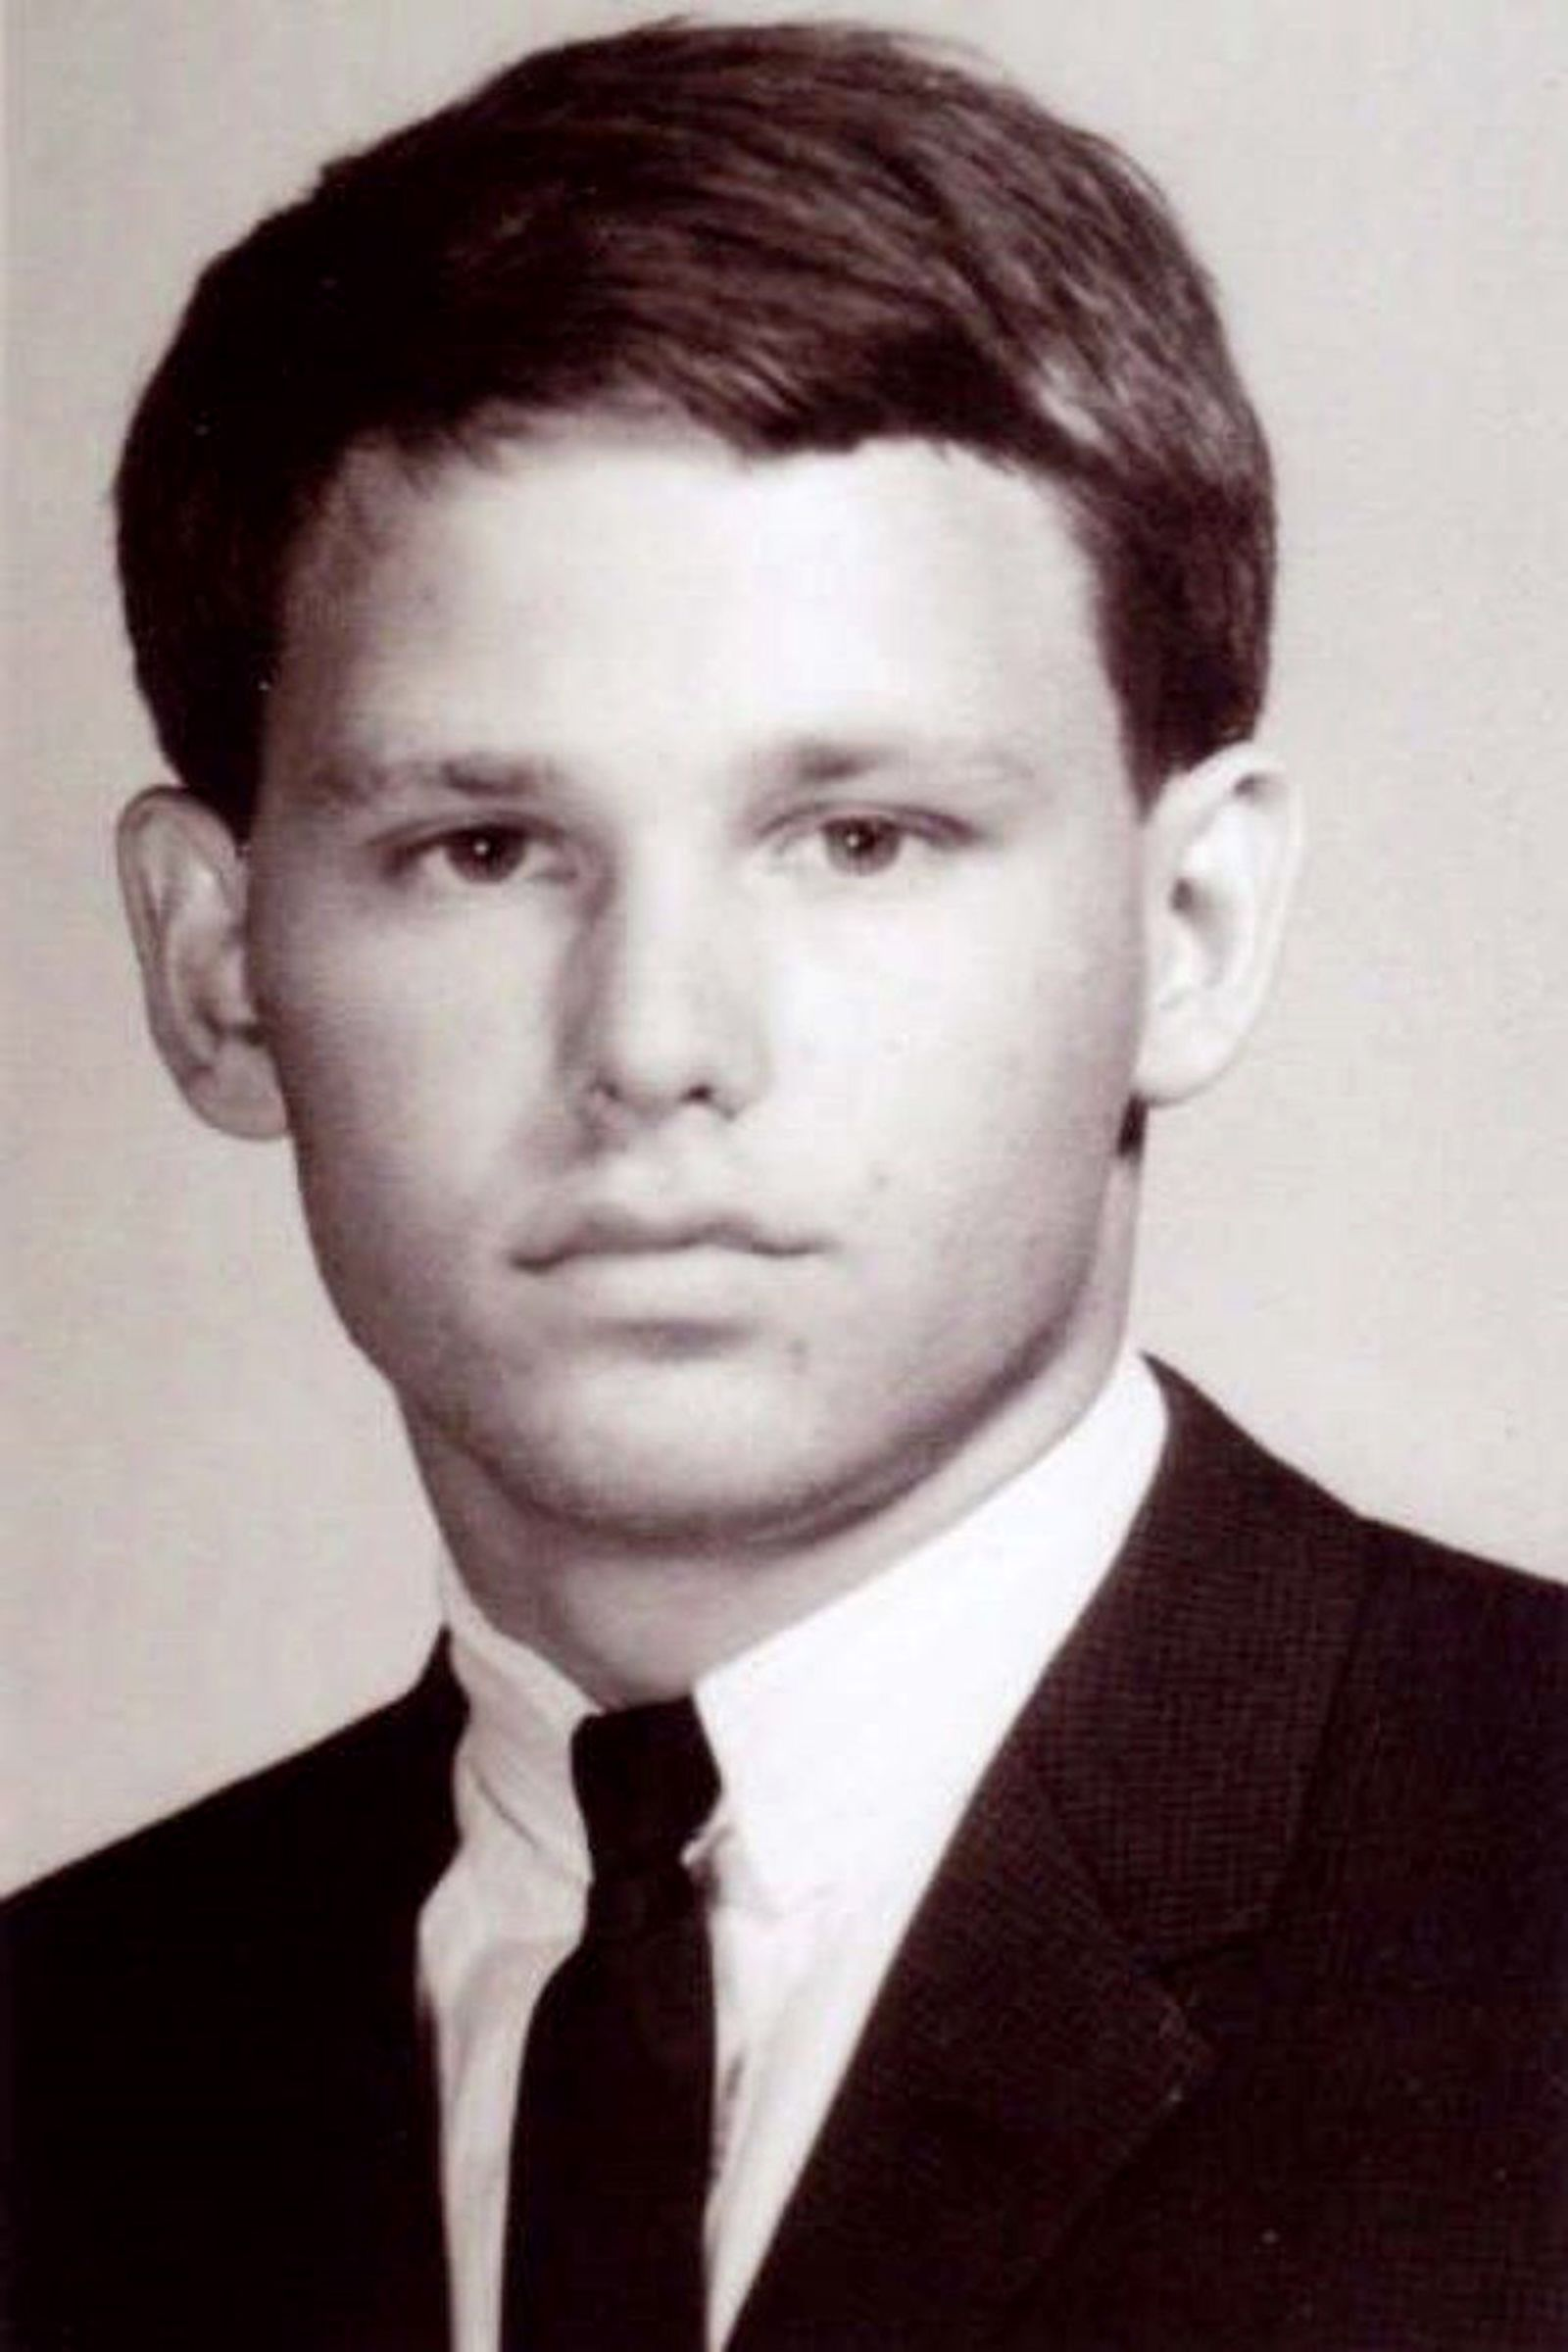 Jim Morrison High School Yearbook Portrait